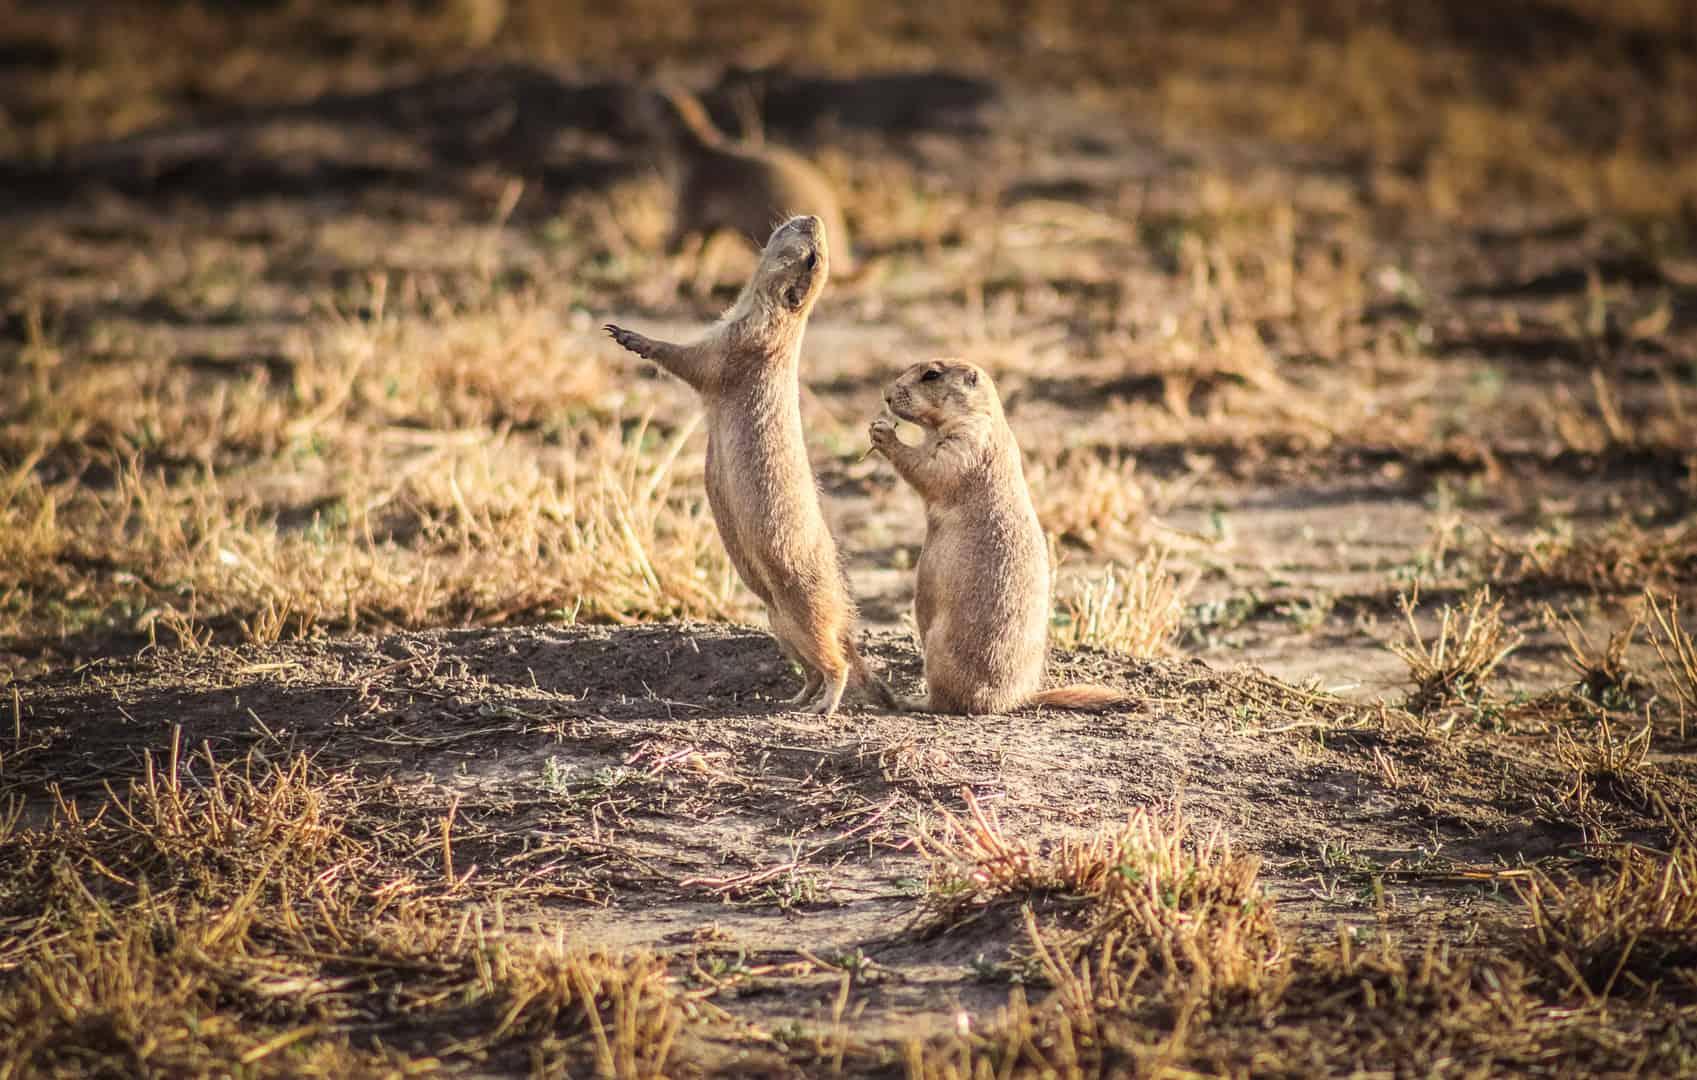 Prairie Dogs in Badlands National Park, South Dakota